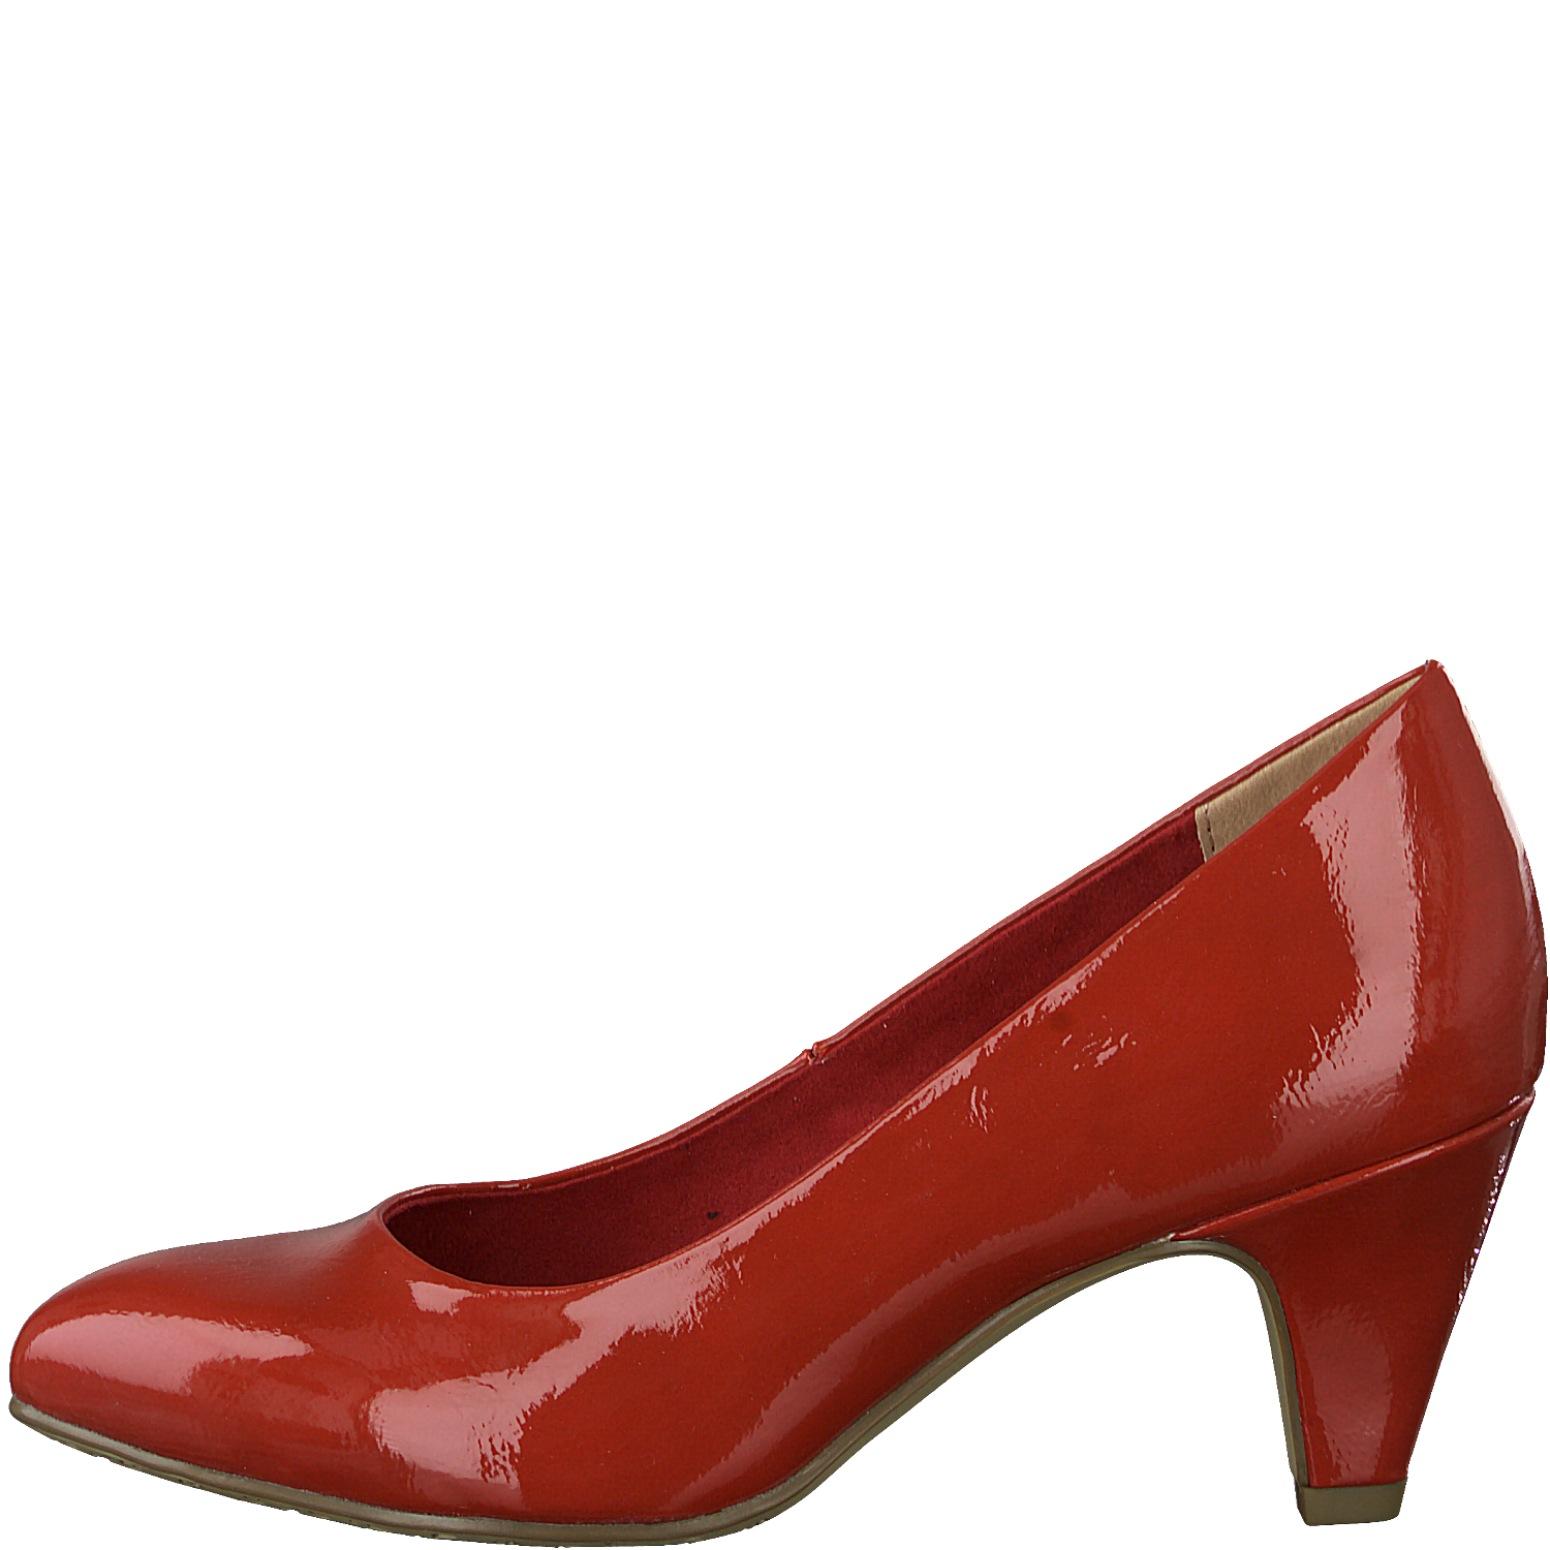 Tamaris Schuhe 1 22416 23 elegante Damen Pumps , | real